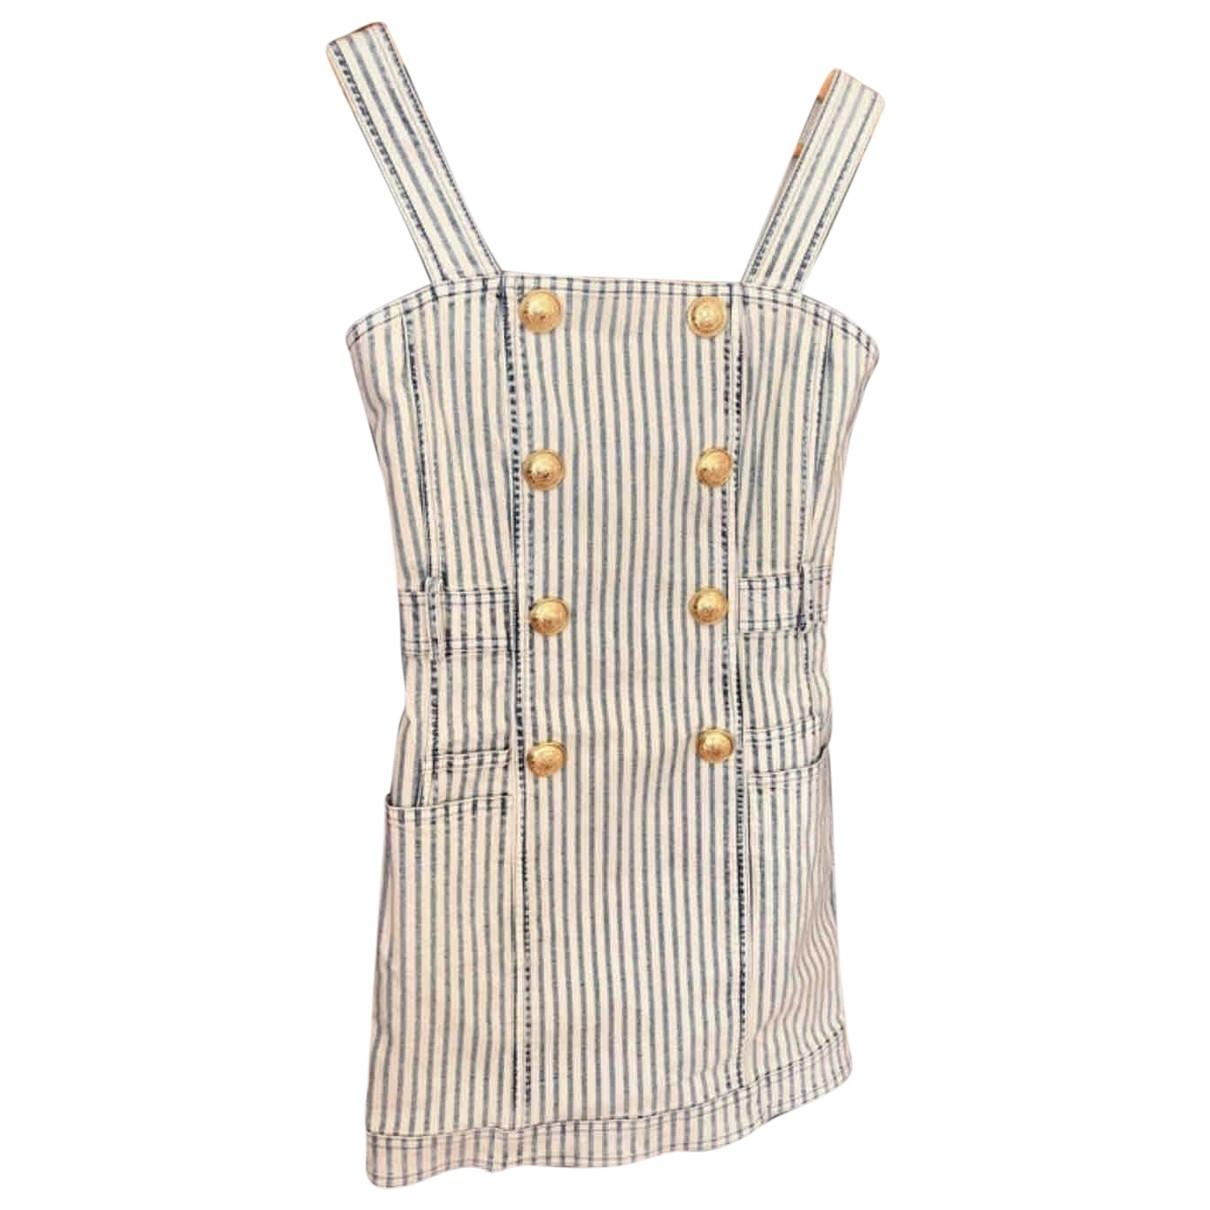 Balmain \N Blue Cotton dress for Women 36 IT